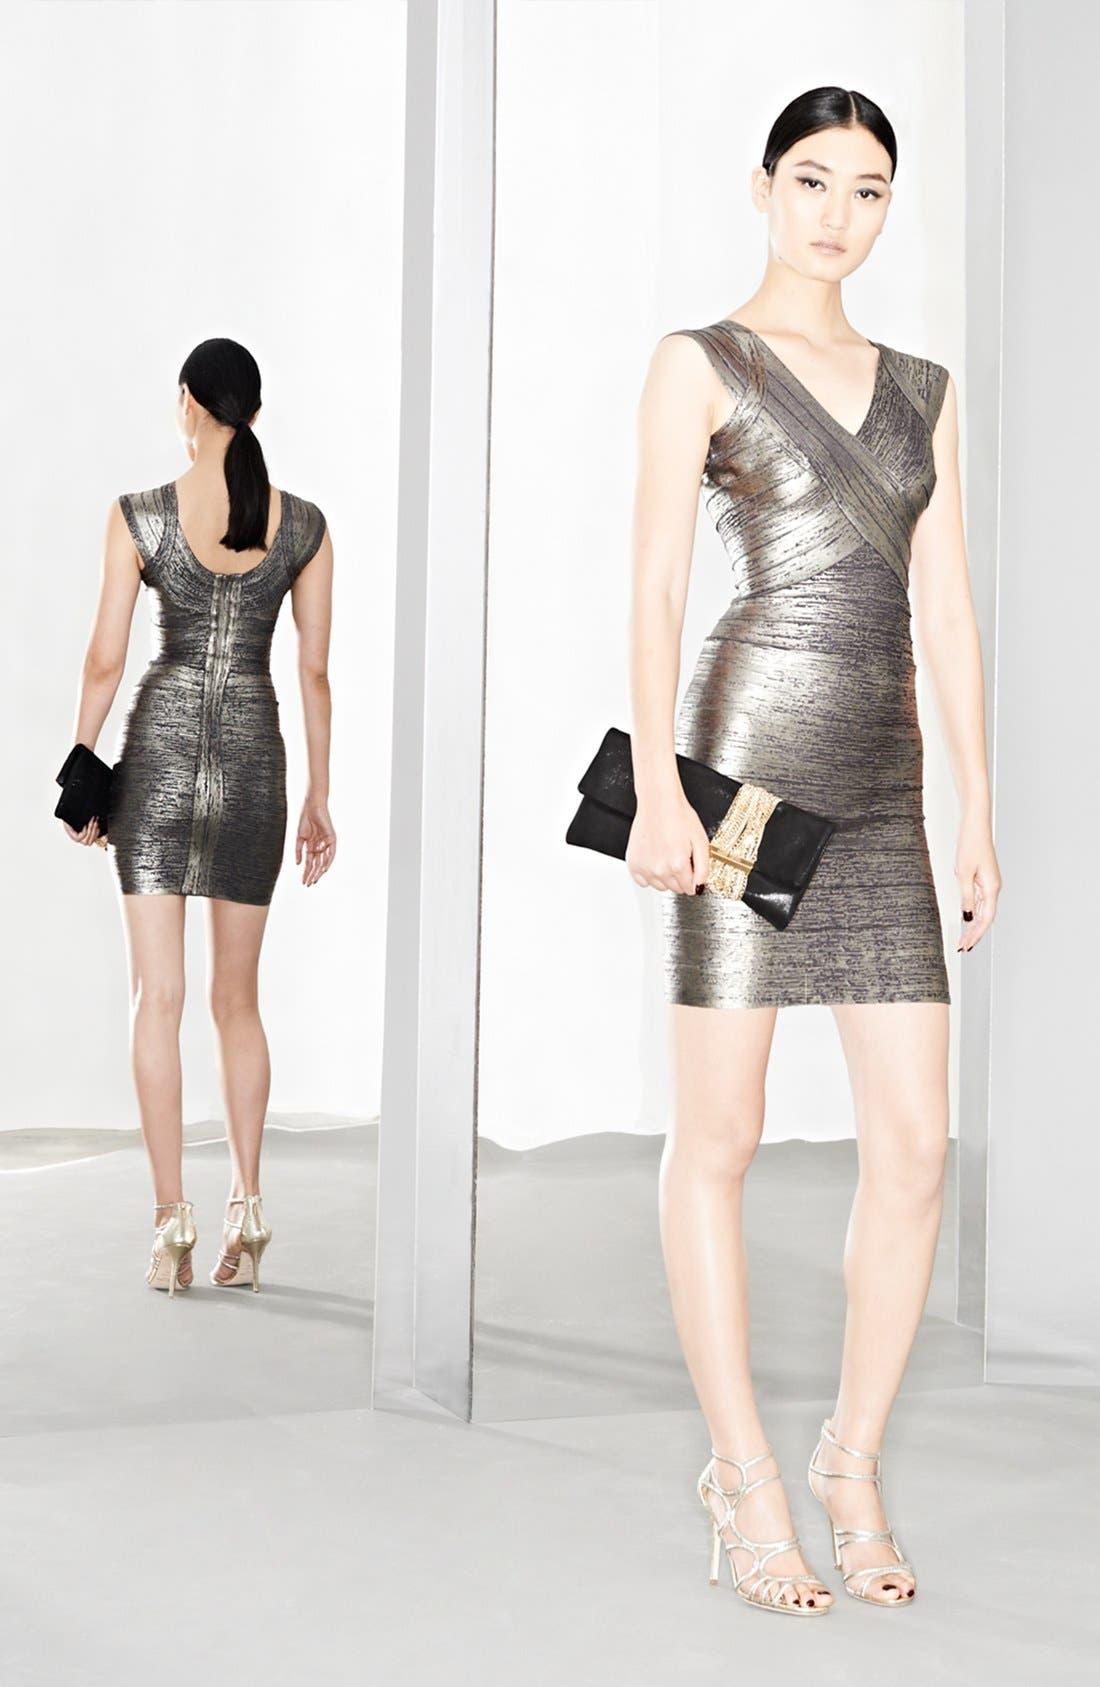 Alternate Image 1 Selected - Herve Leger Dress & Accessories